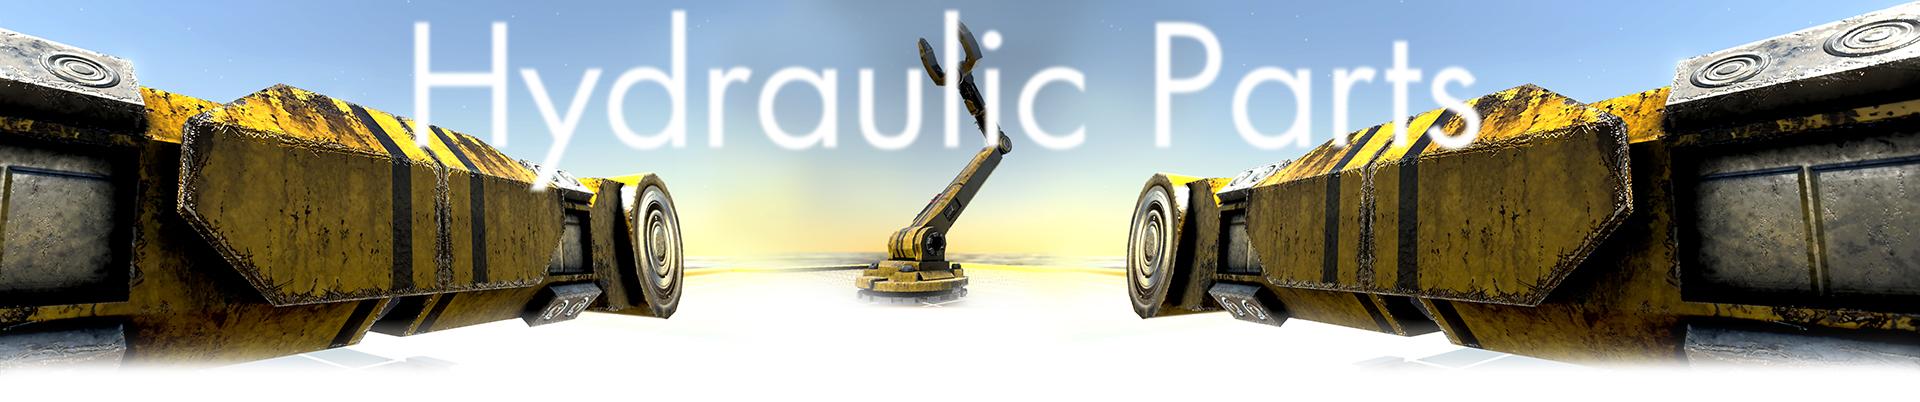 Hydraulic Parts HTML5